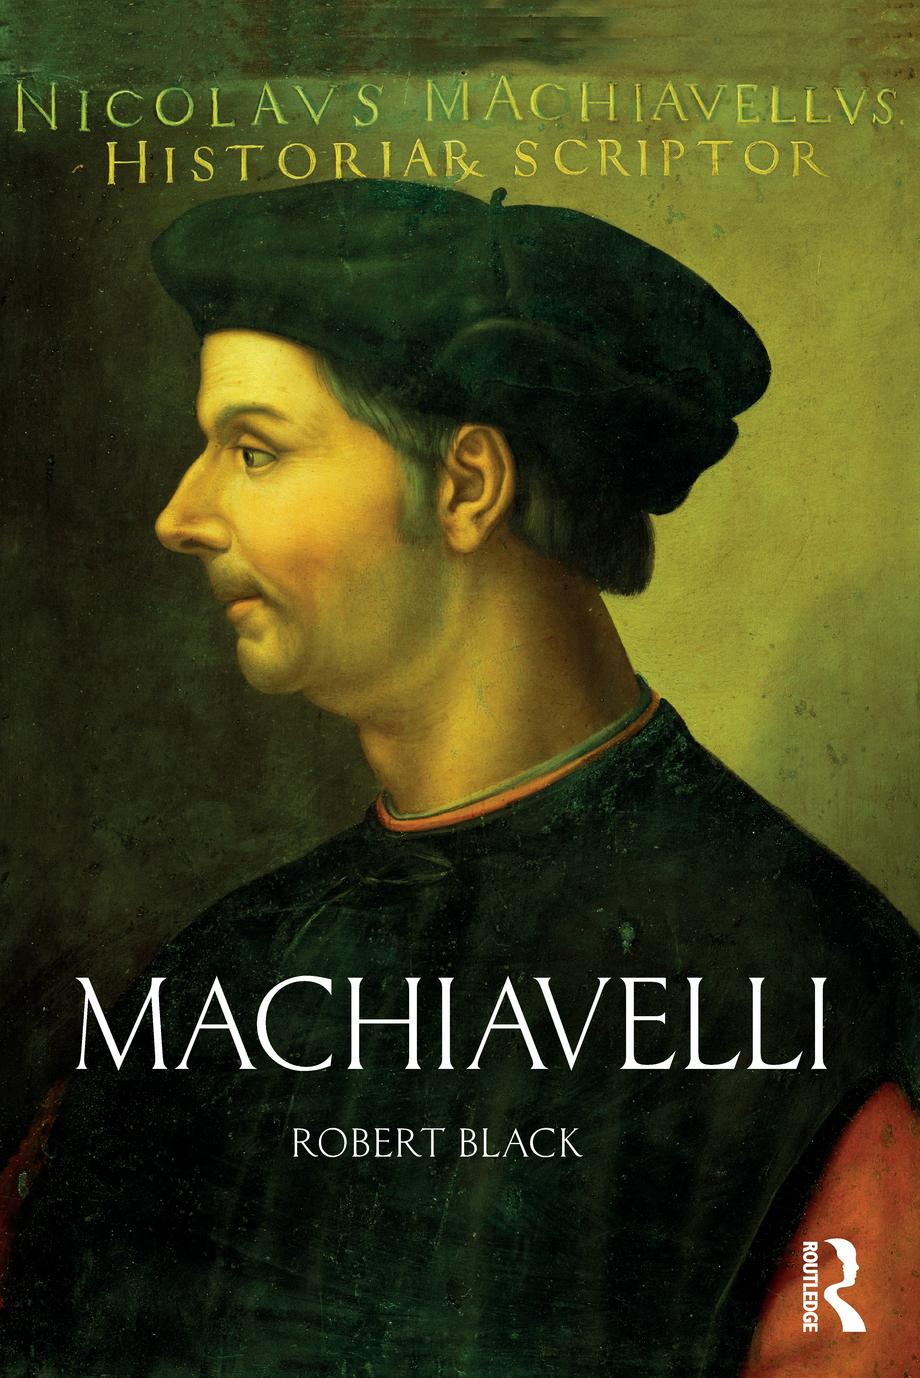 machiavelli the power of fear essay